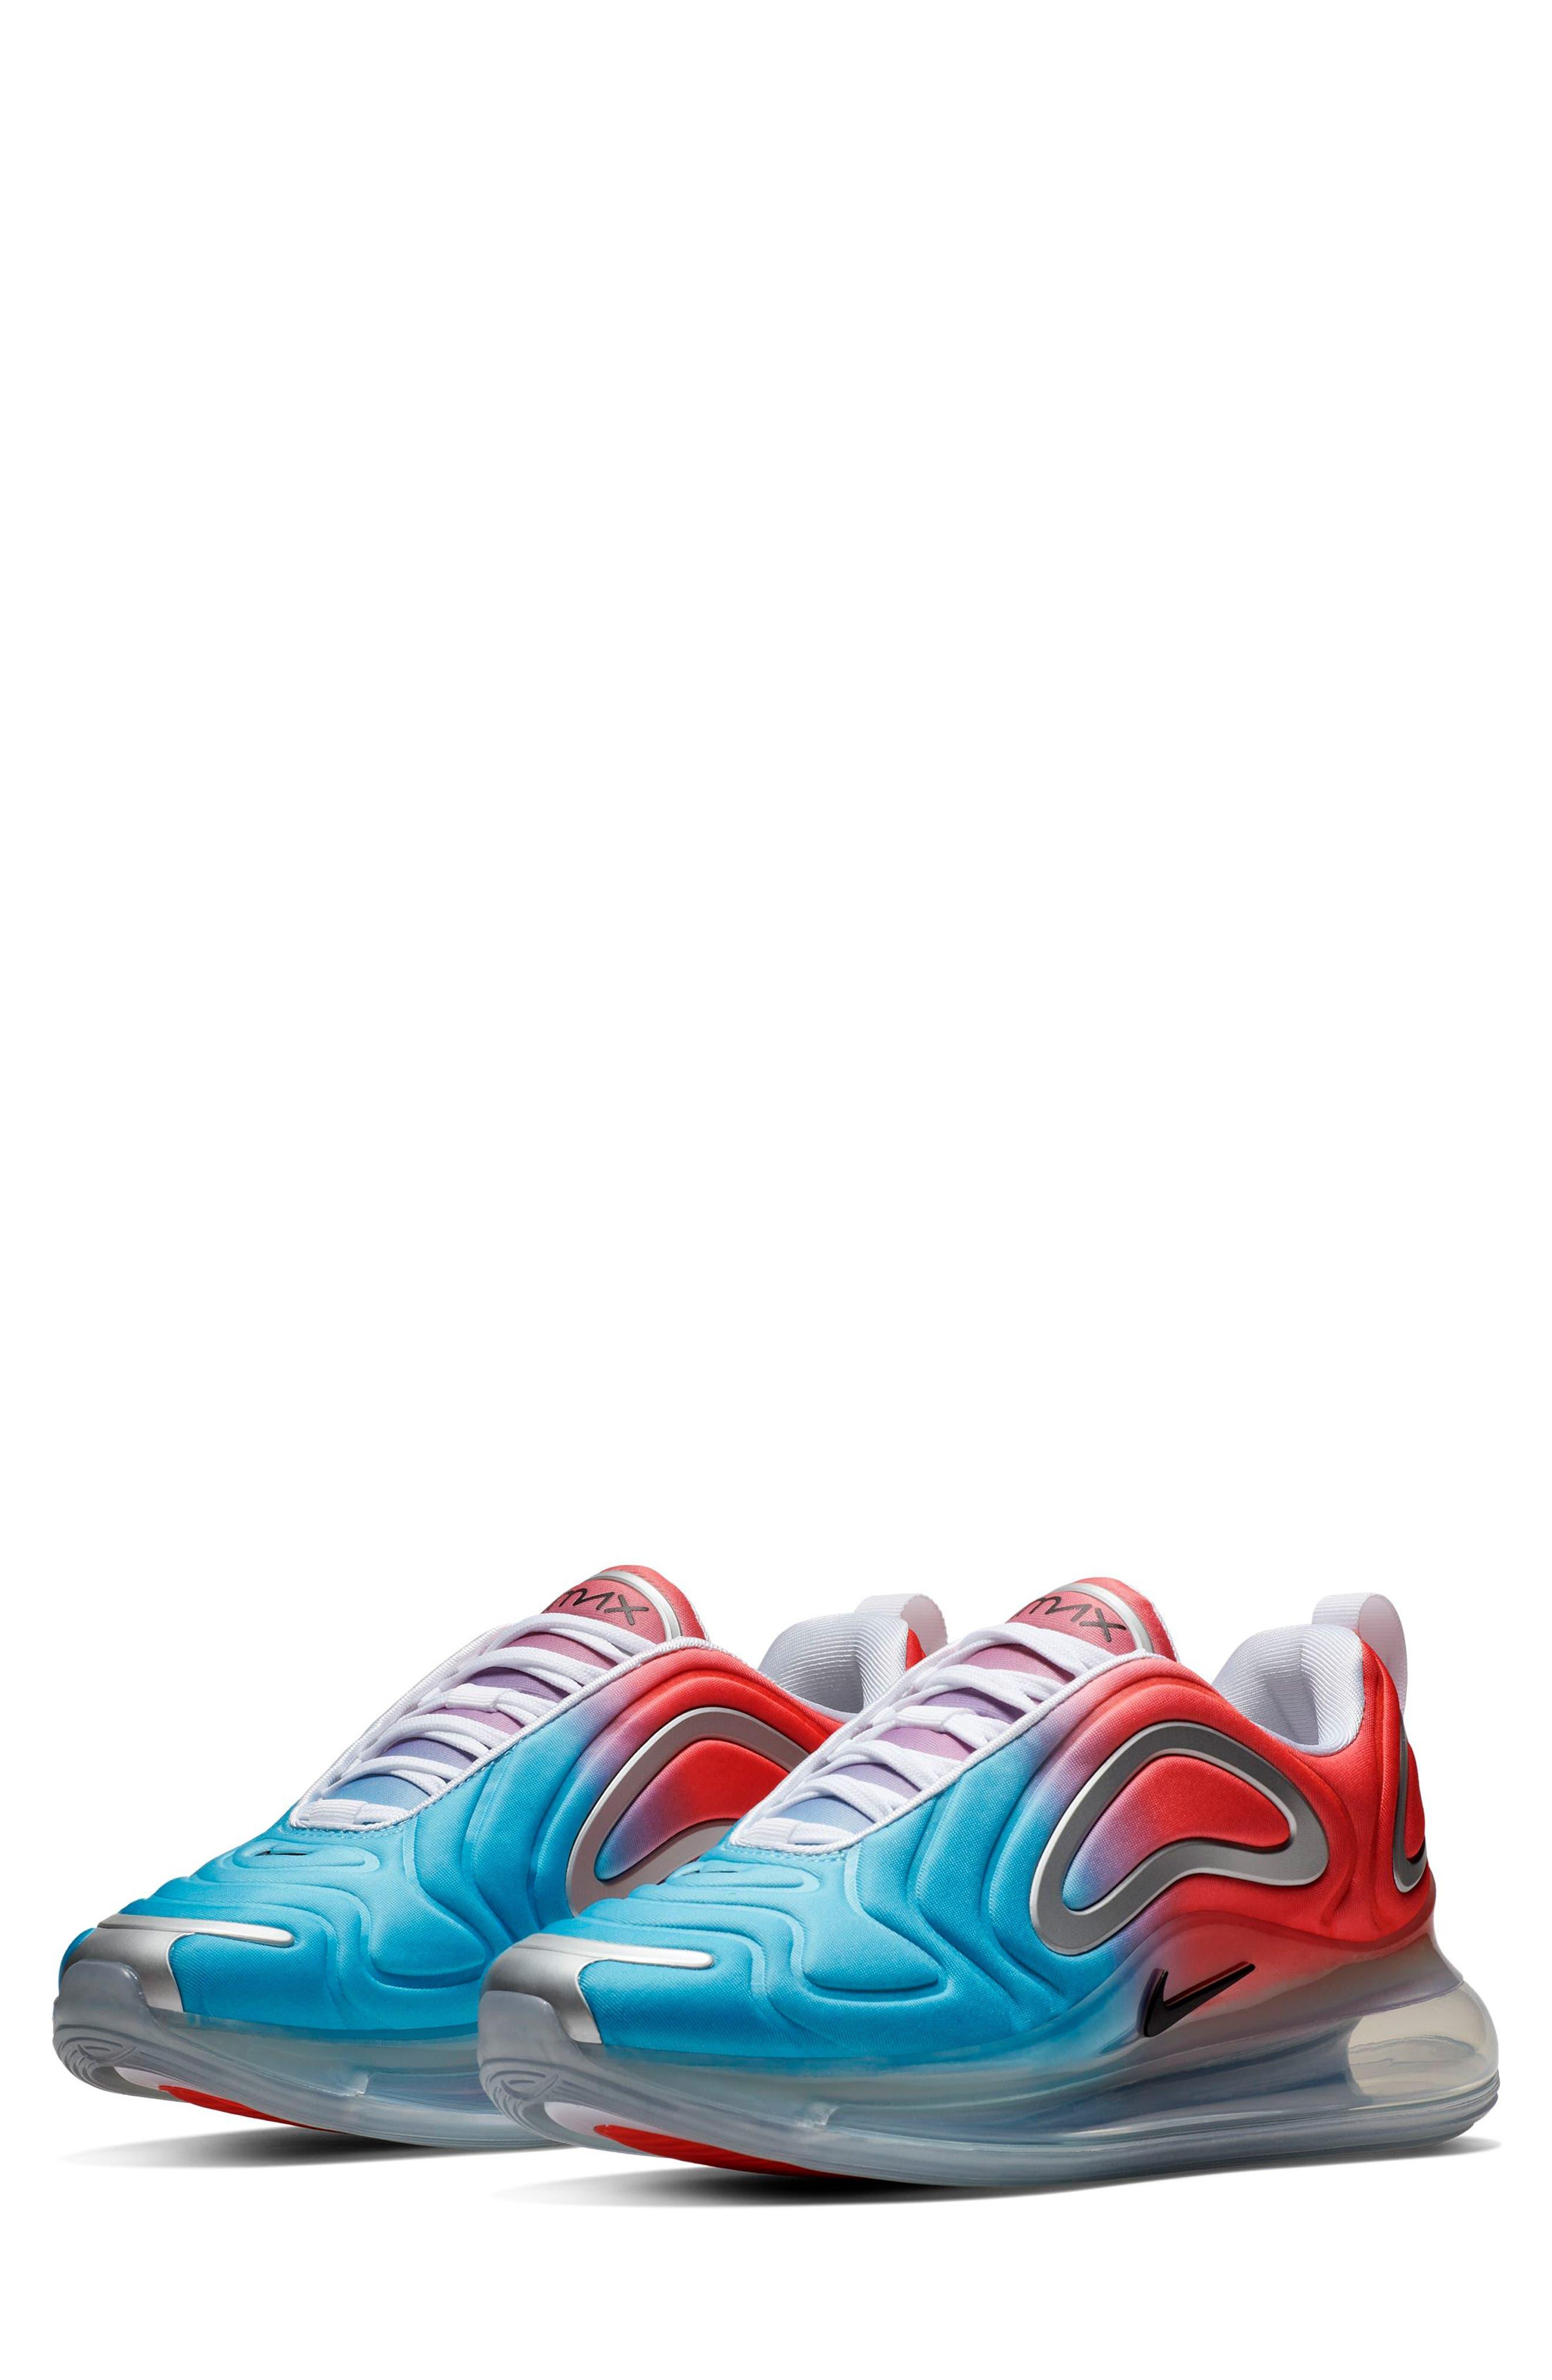 nike bruin shoe red and white gold blue Air Jordan 1 Mid Gets A Dark Grey  ... 1a0b9b7b0